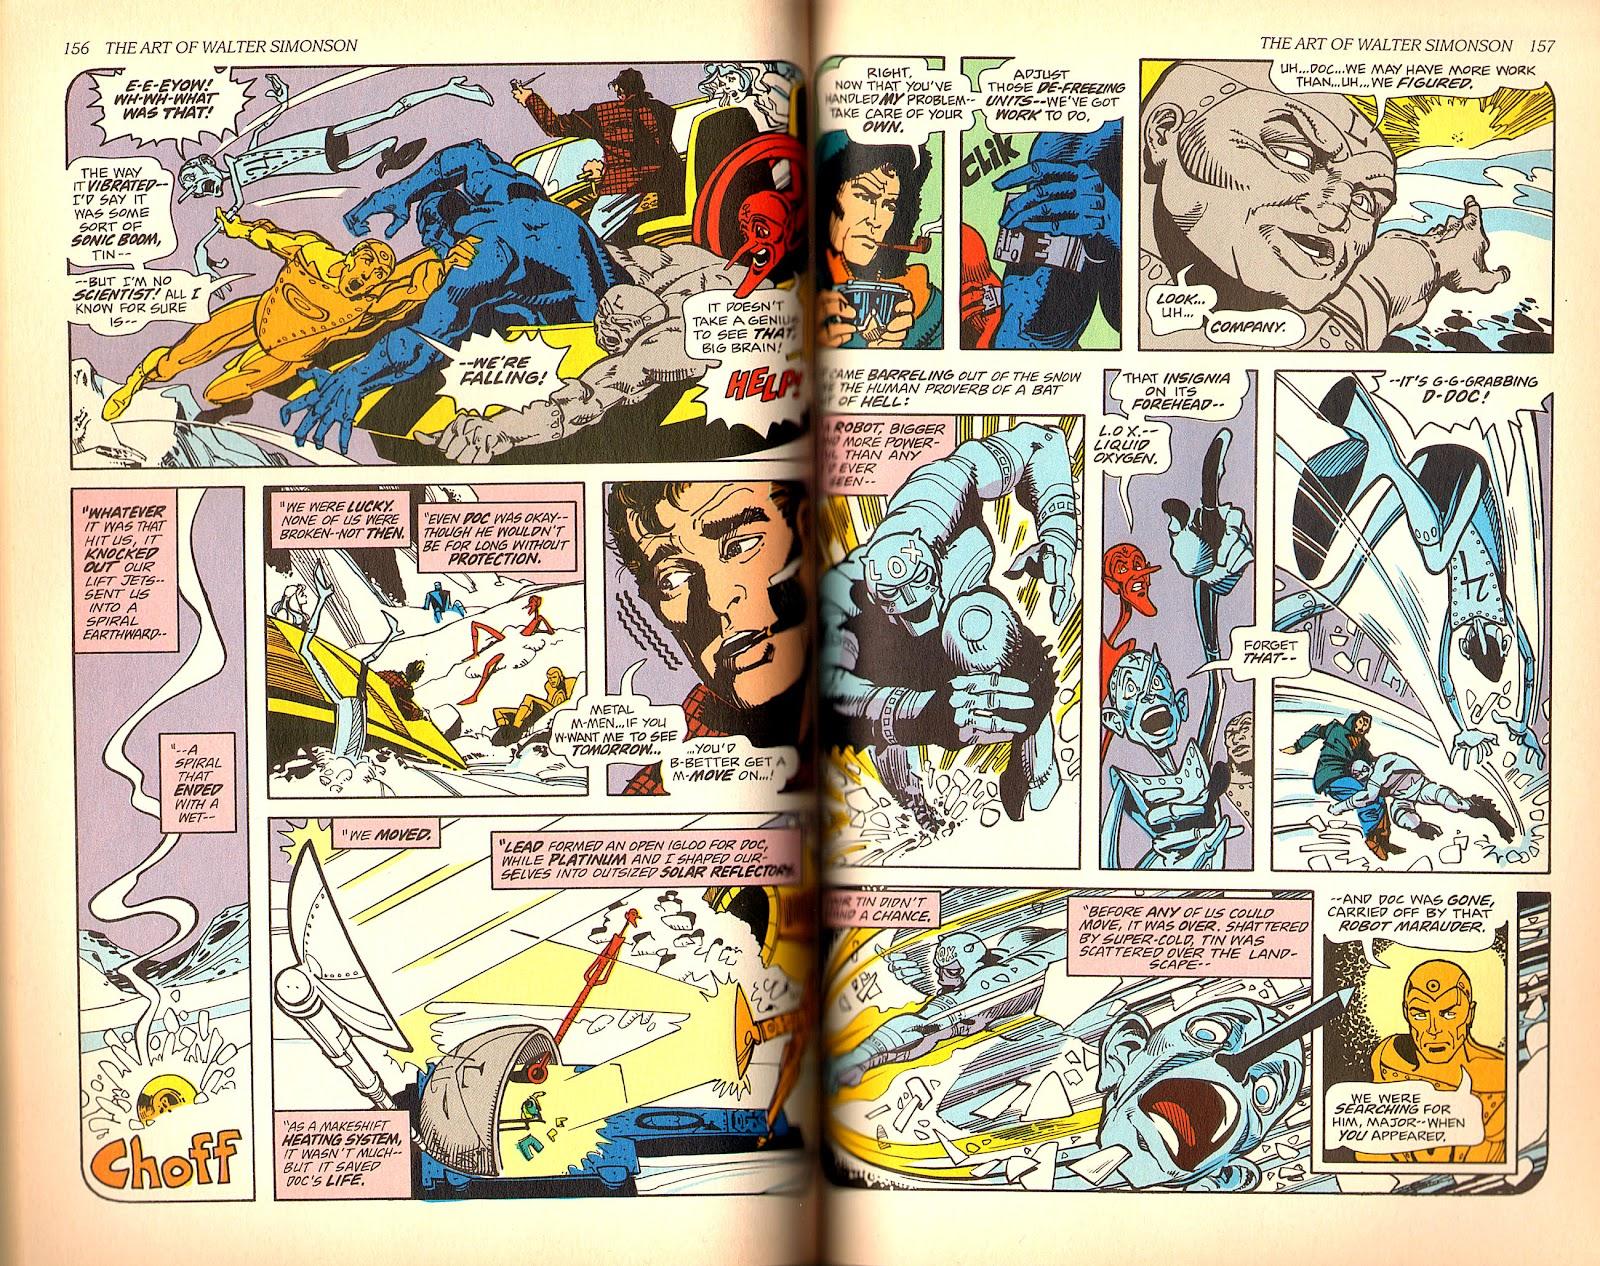 Read online The Art of Walter Simonson comic -  Issue # TPB - 80